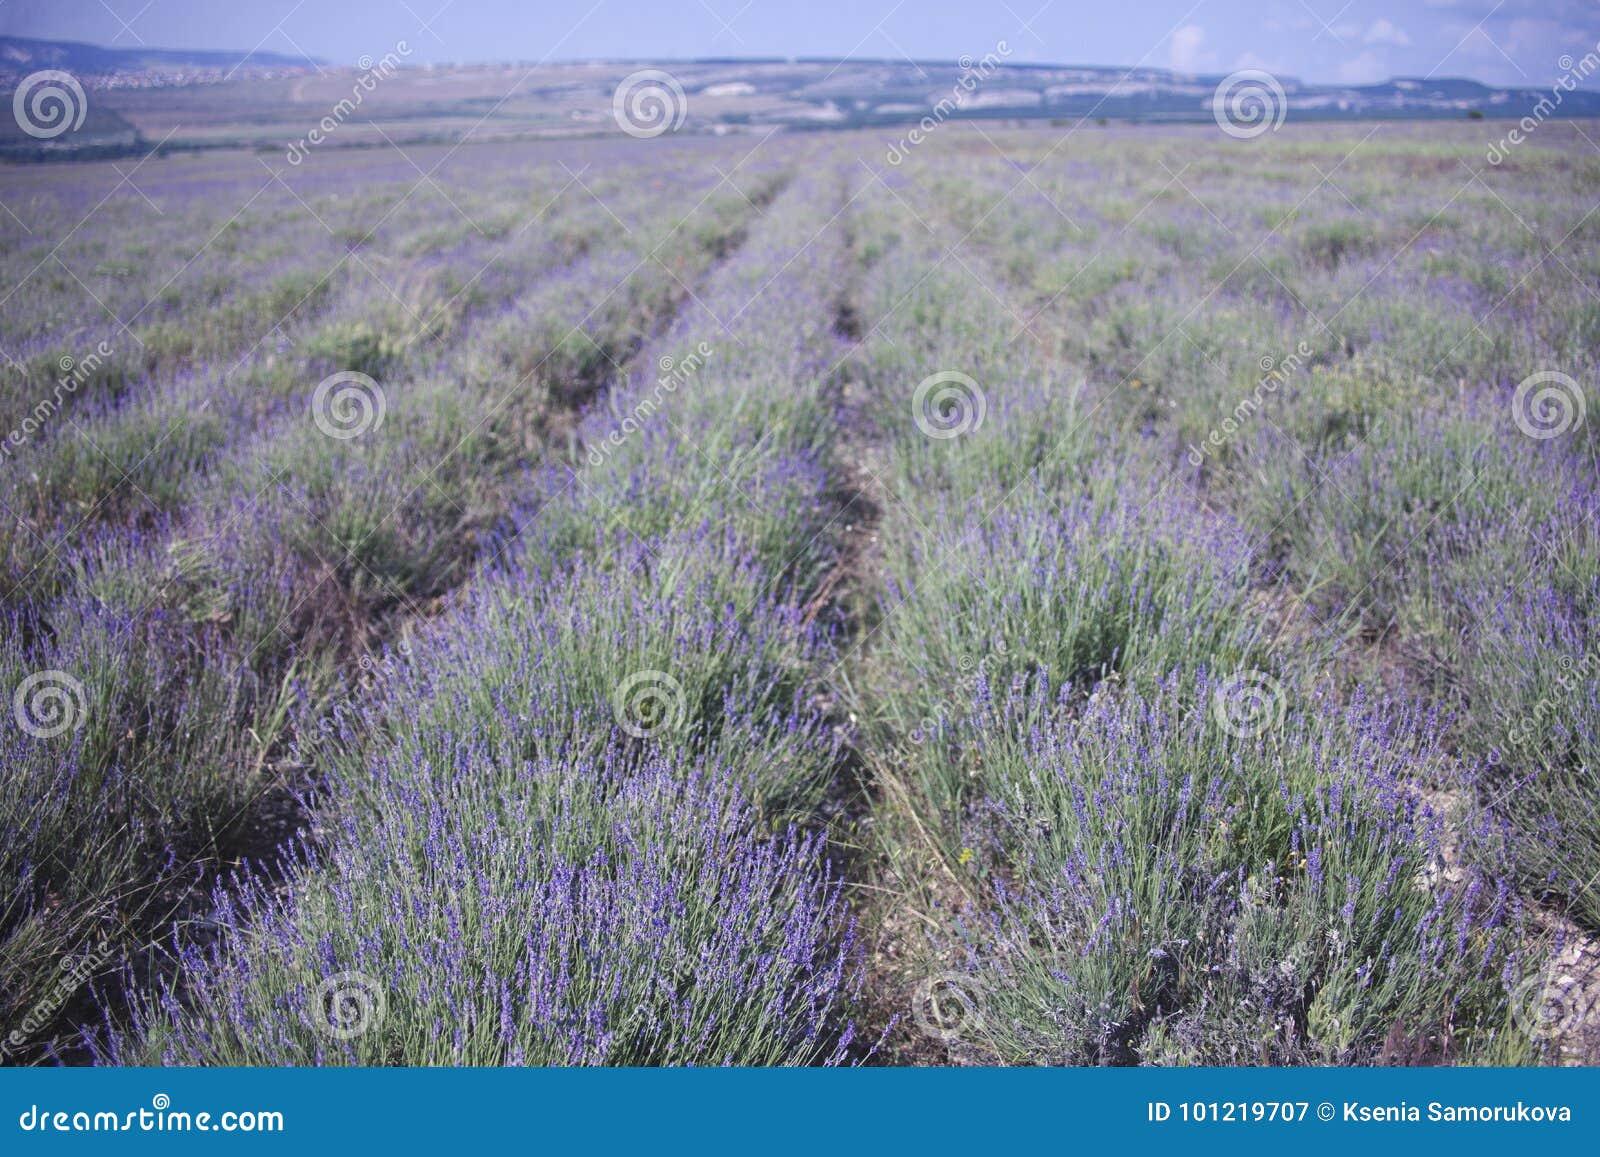 Lavender flowers field. Crimea landscape